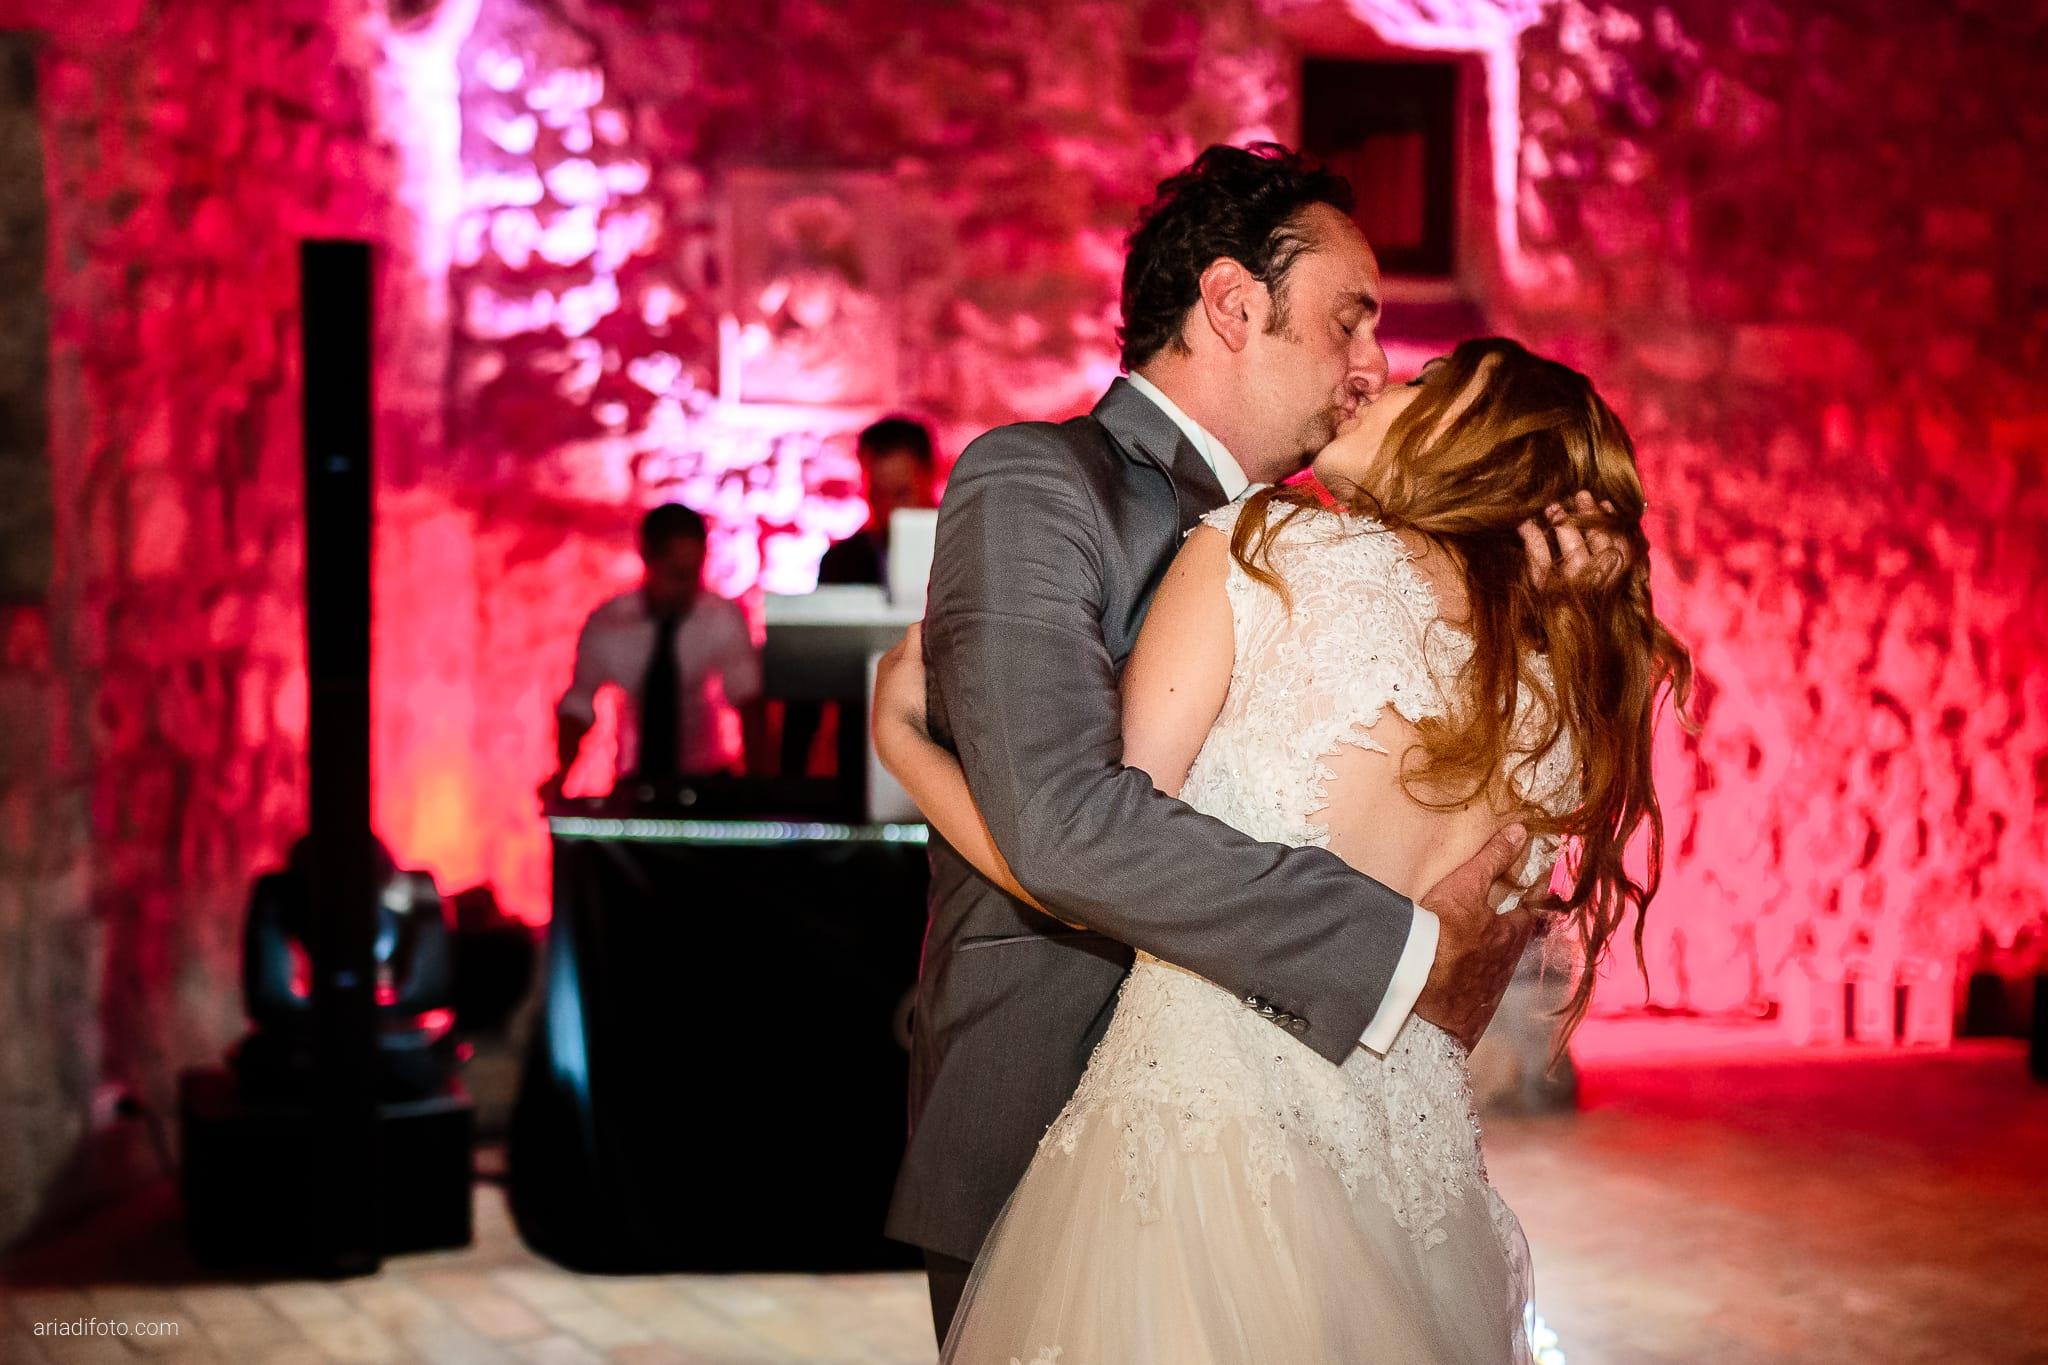 Valentina Francesco Matrimonio Pagnacco Castello Villalta Fagagna Udine ricevimento festa primo ballo